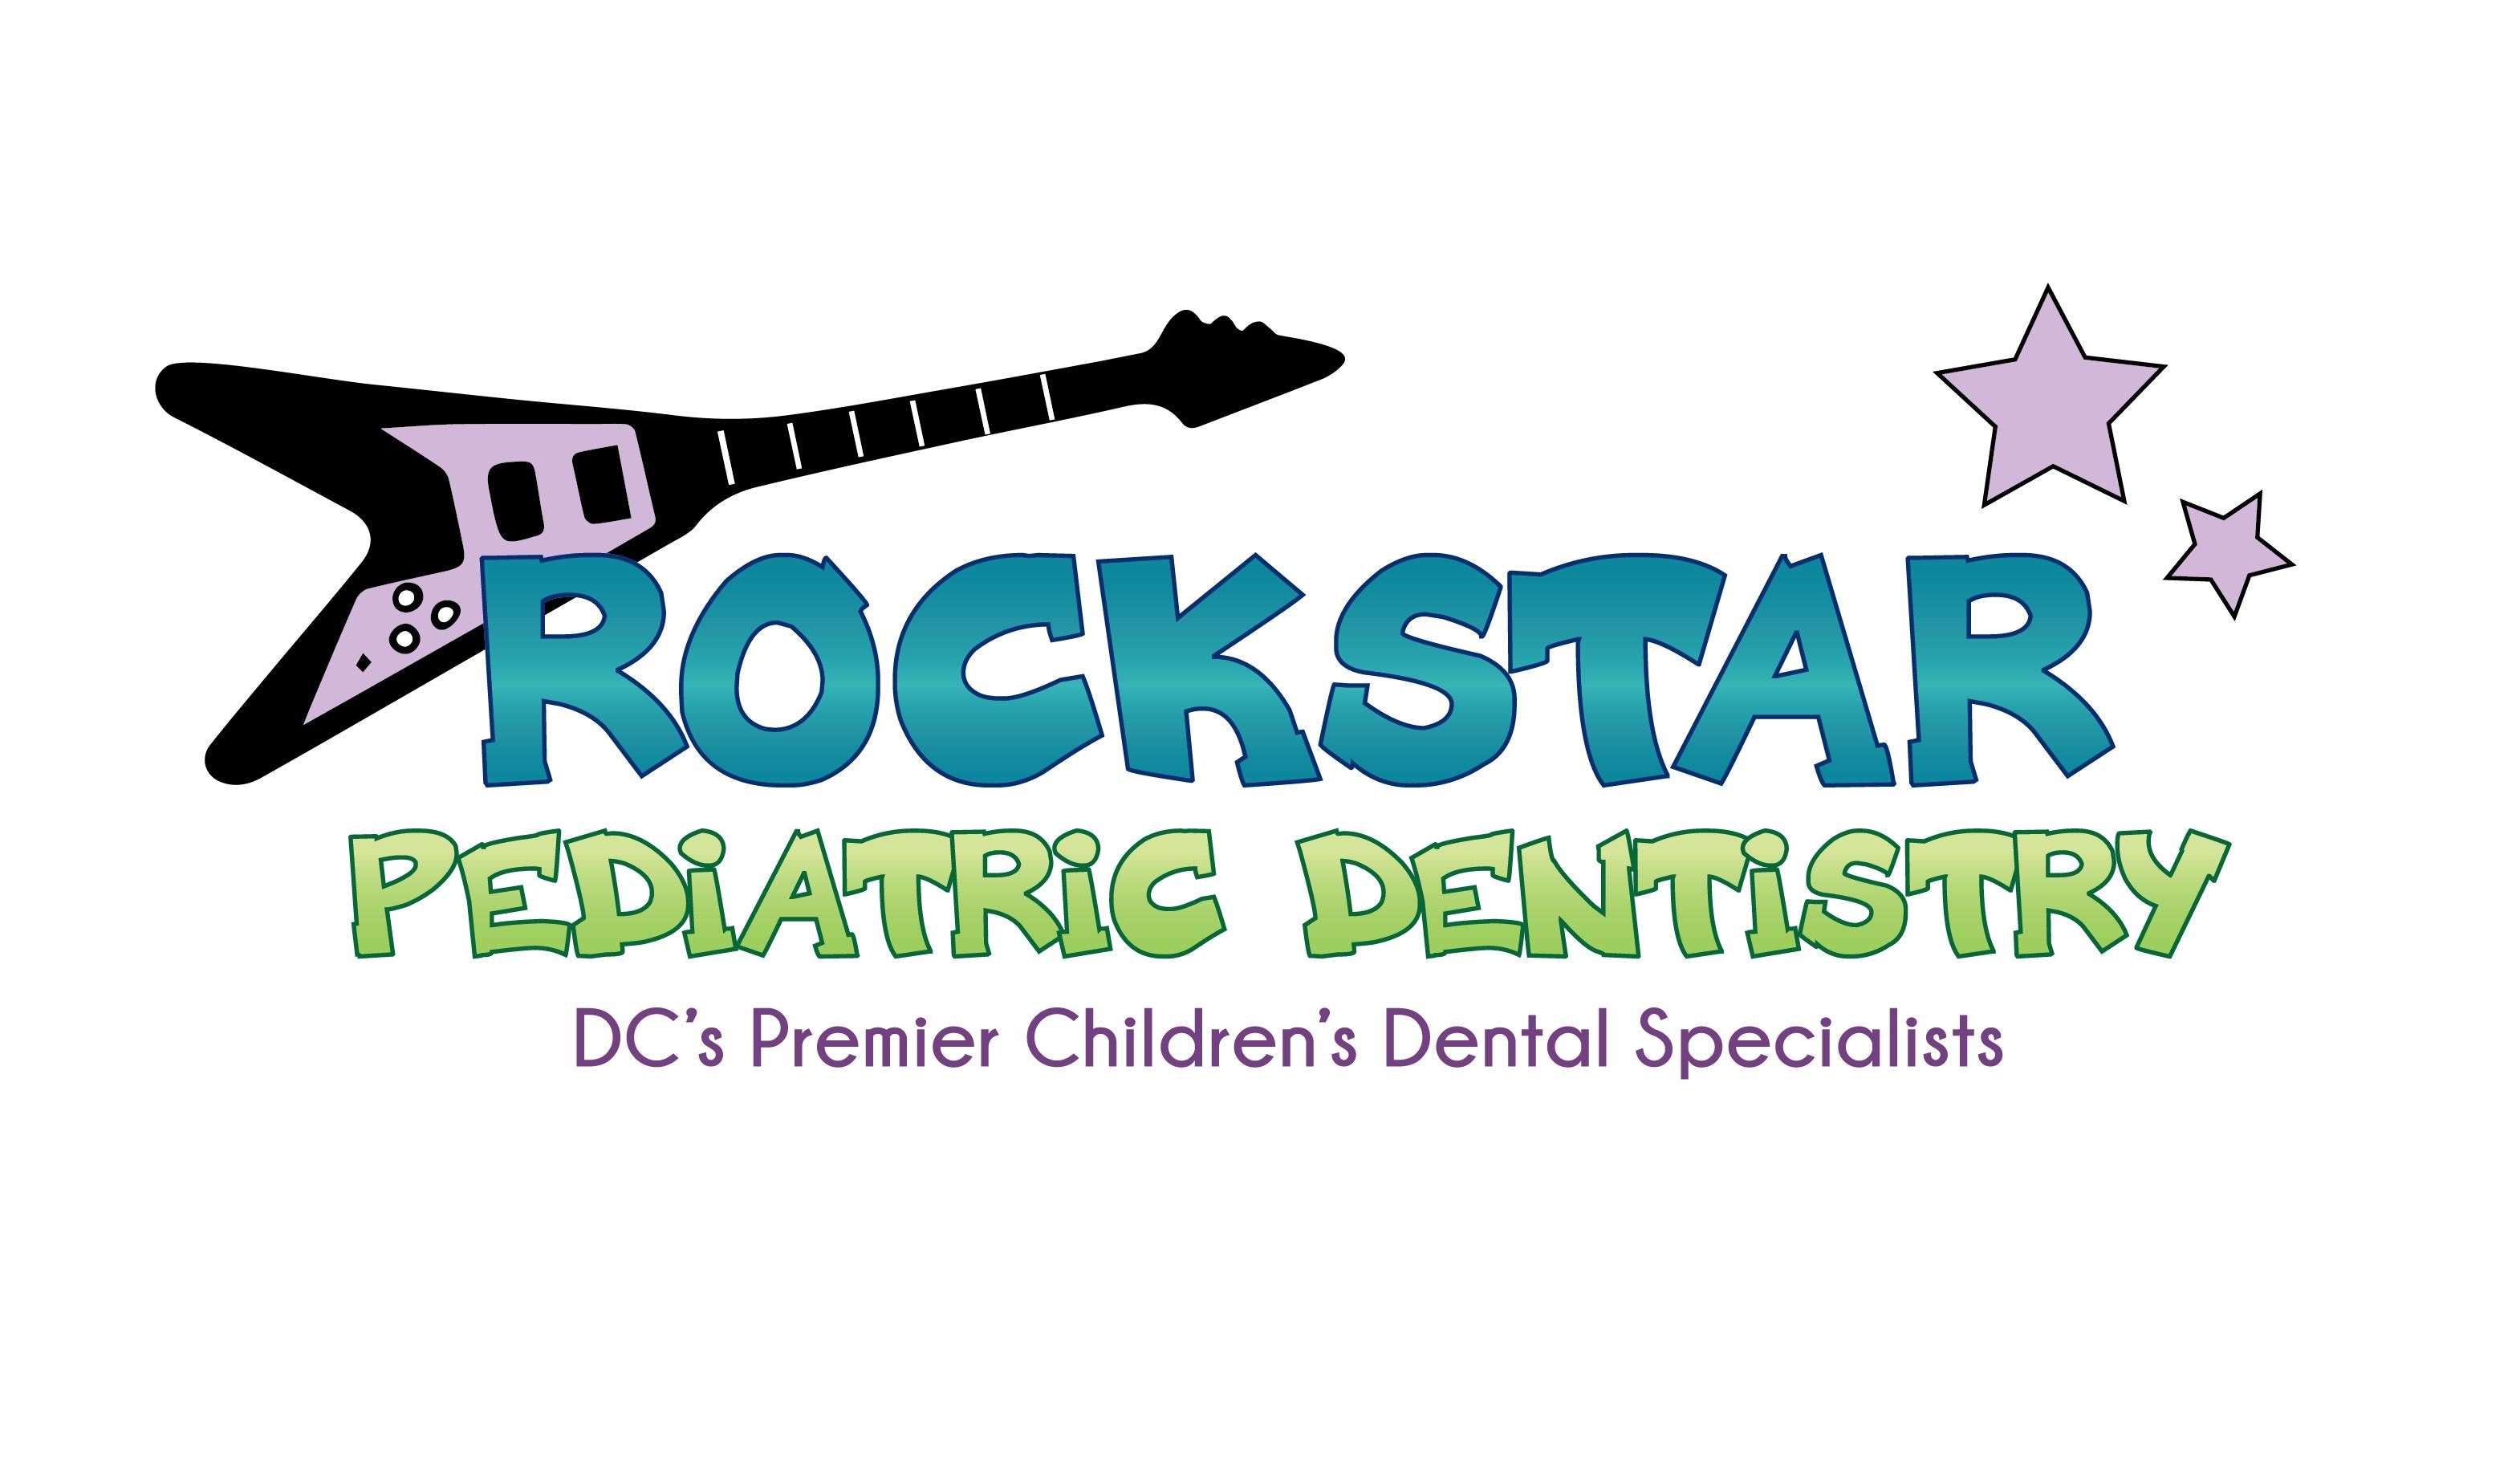 Rockstar Pediatric Dentistry